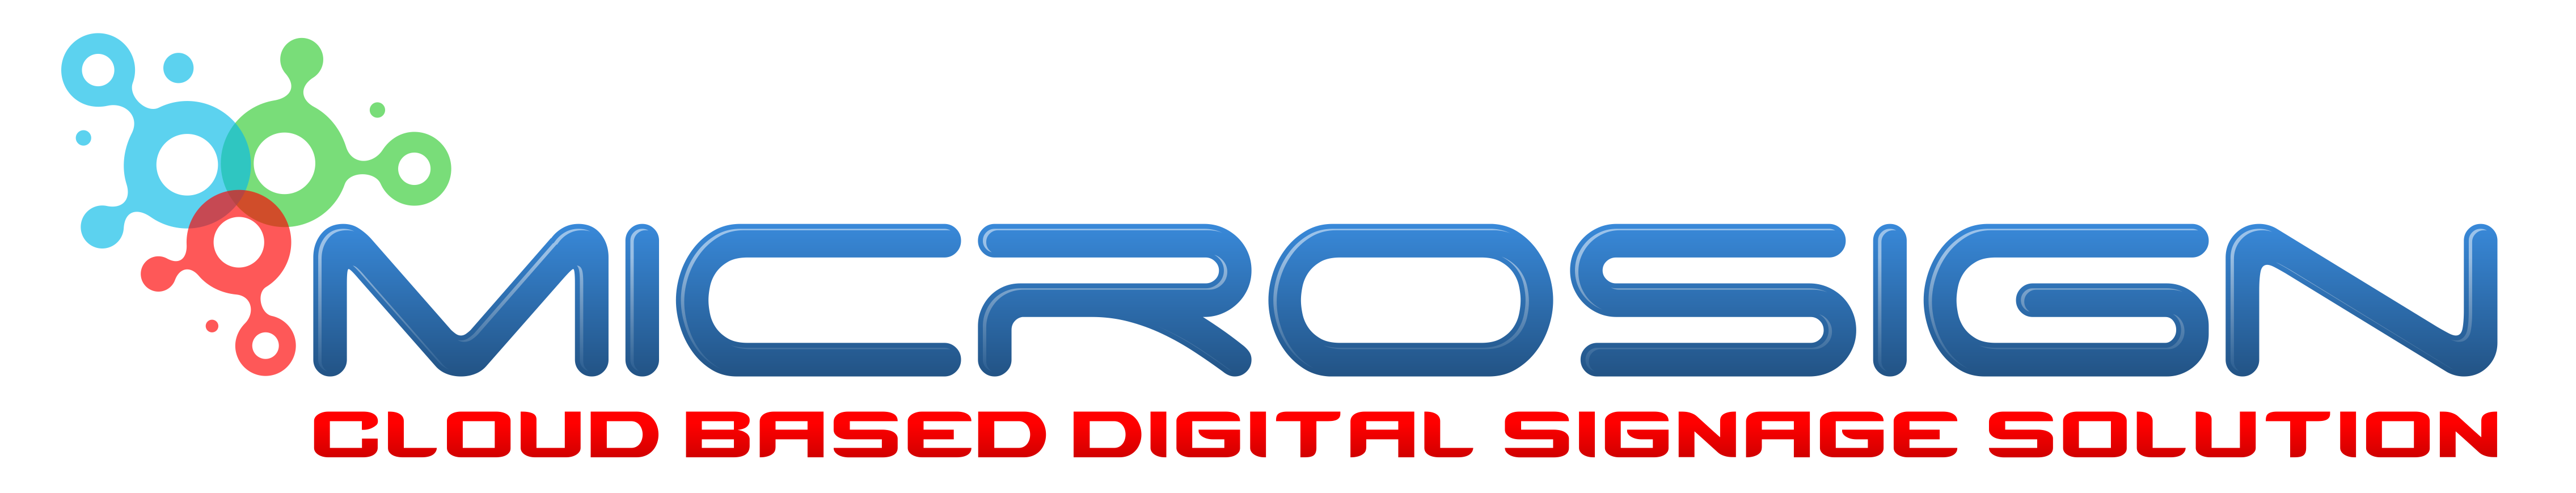 Microsign Logo Colored